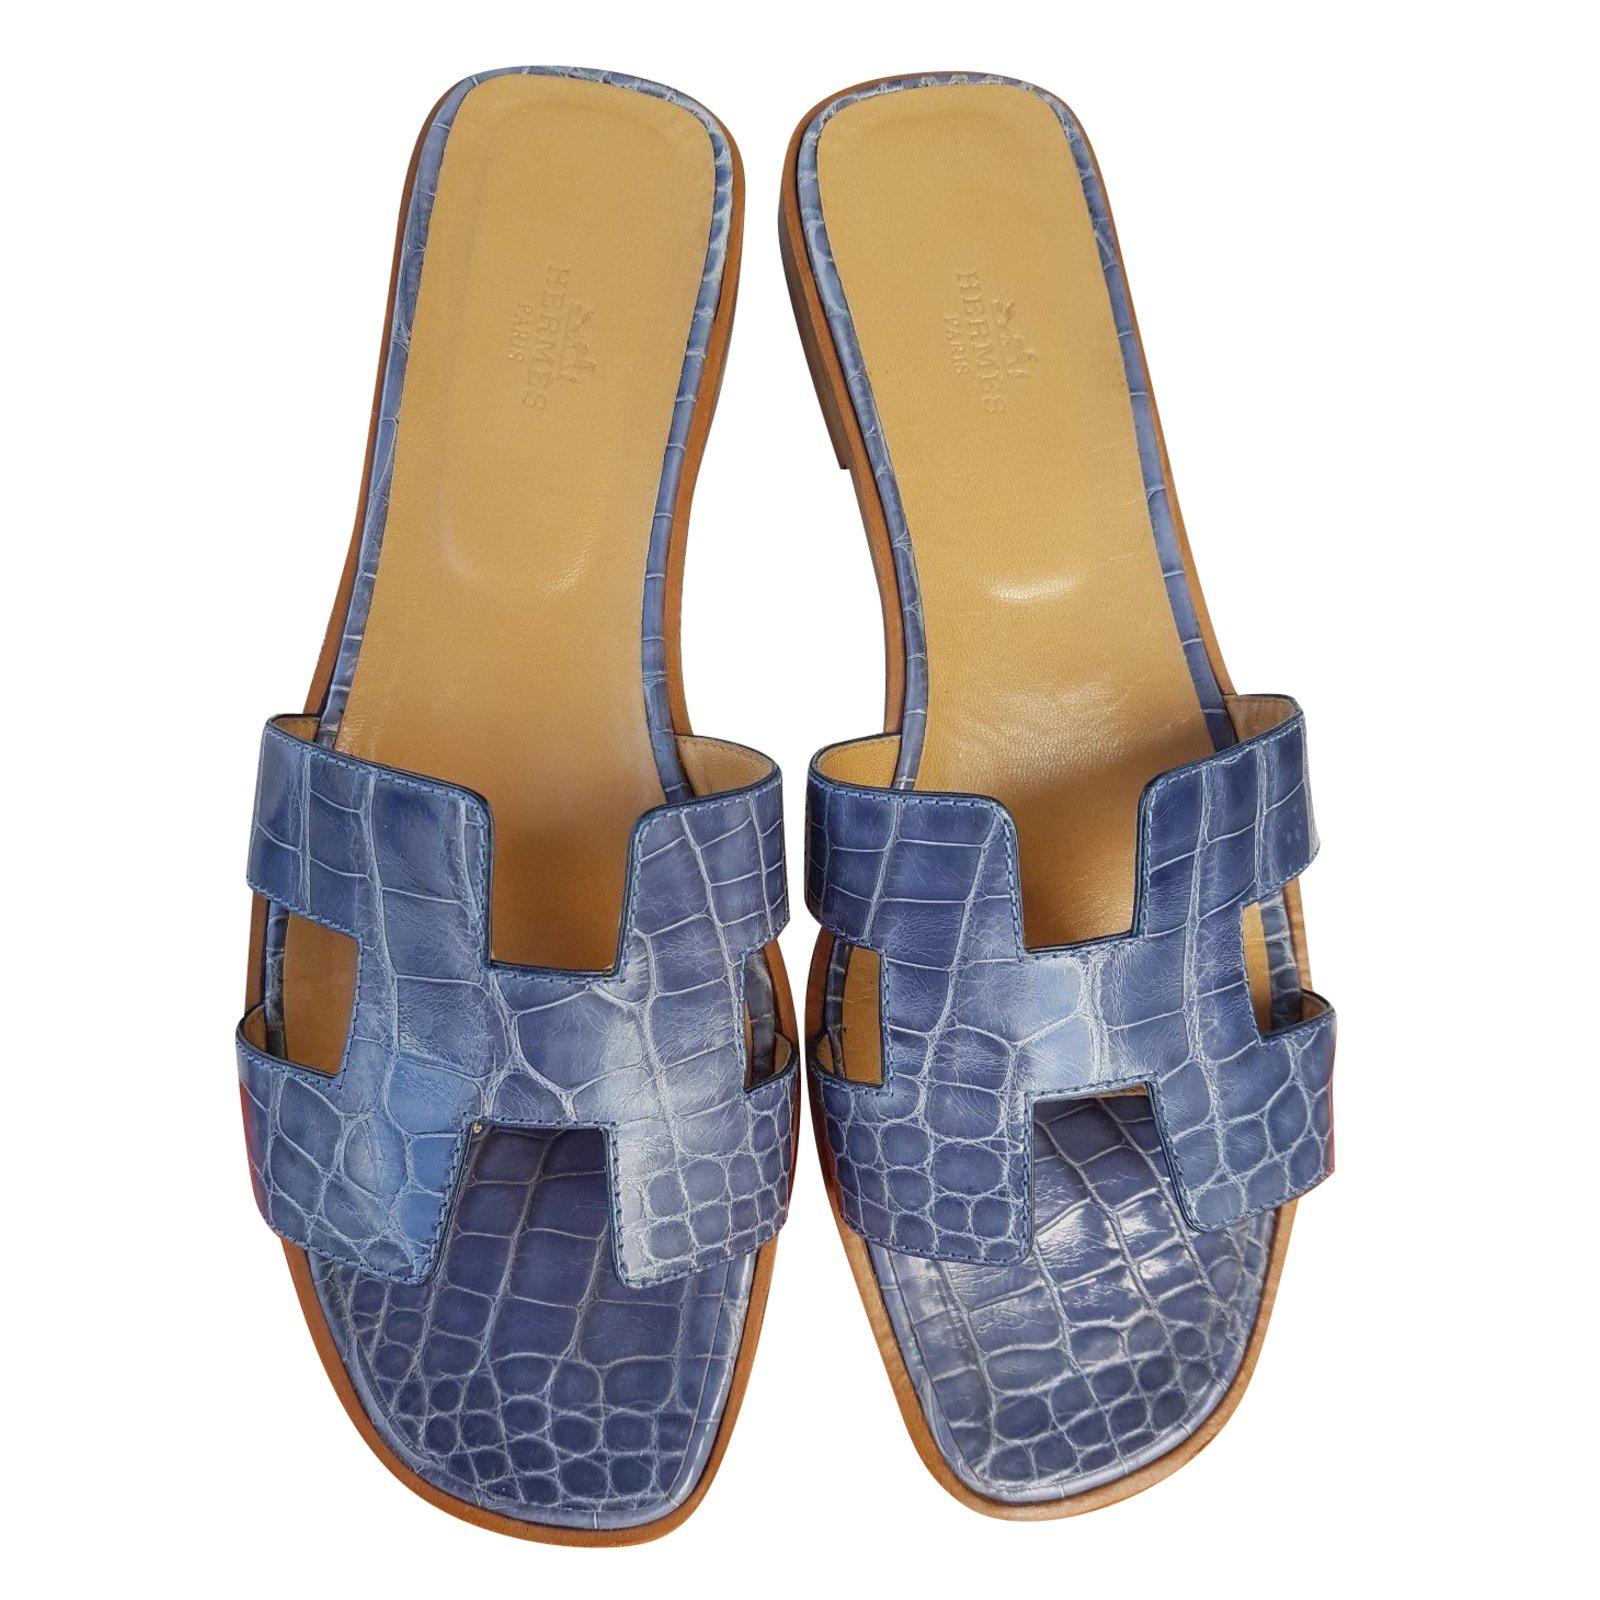 defd2086f18e Hermès Oran flat sandals in crocodile Sandals Exotic leather Blue ref.41620